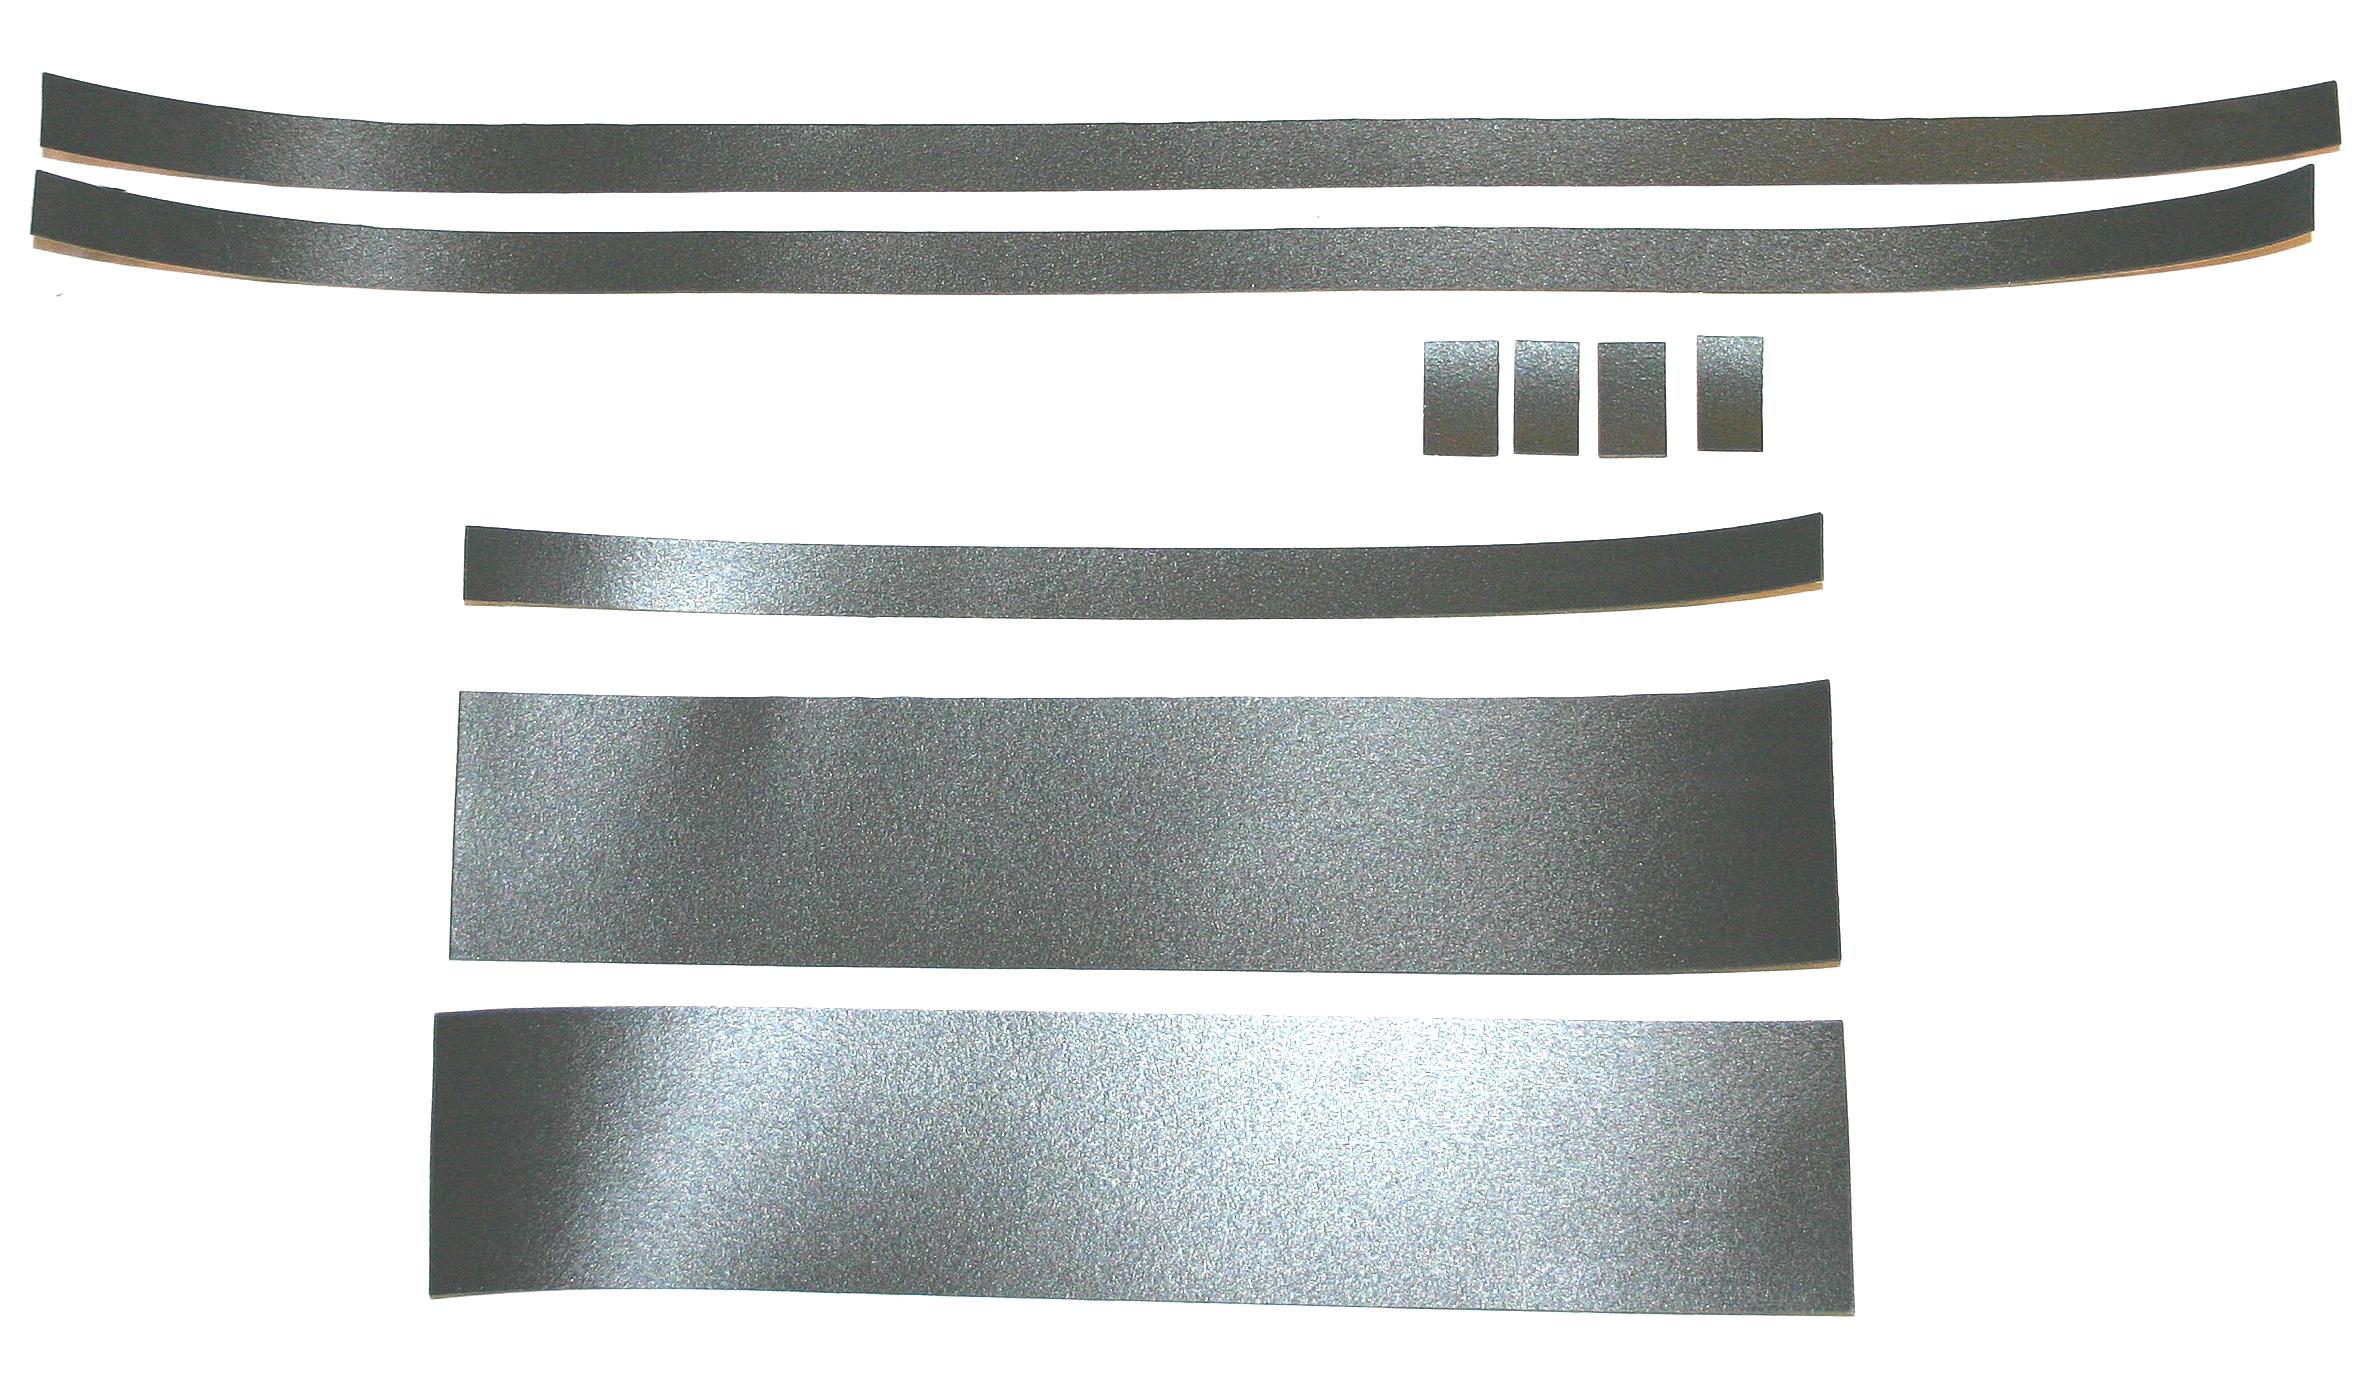 2CV Shop - Montagesatz für Fahrzeugrahmen, AK400